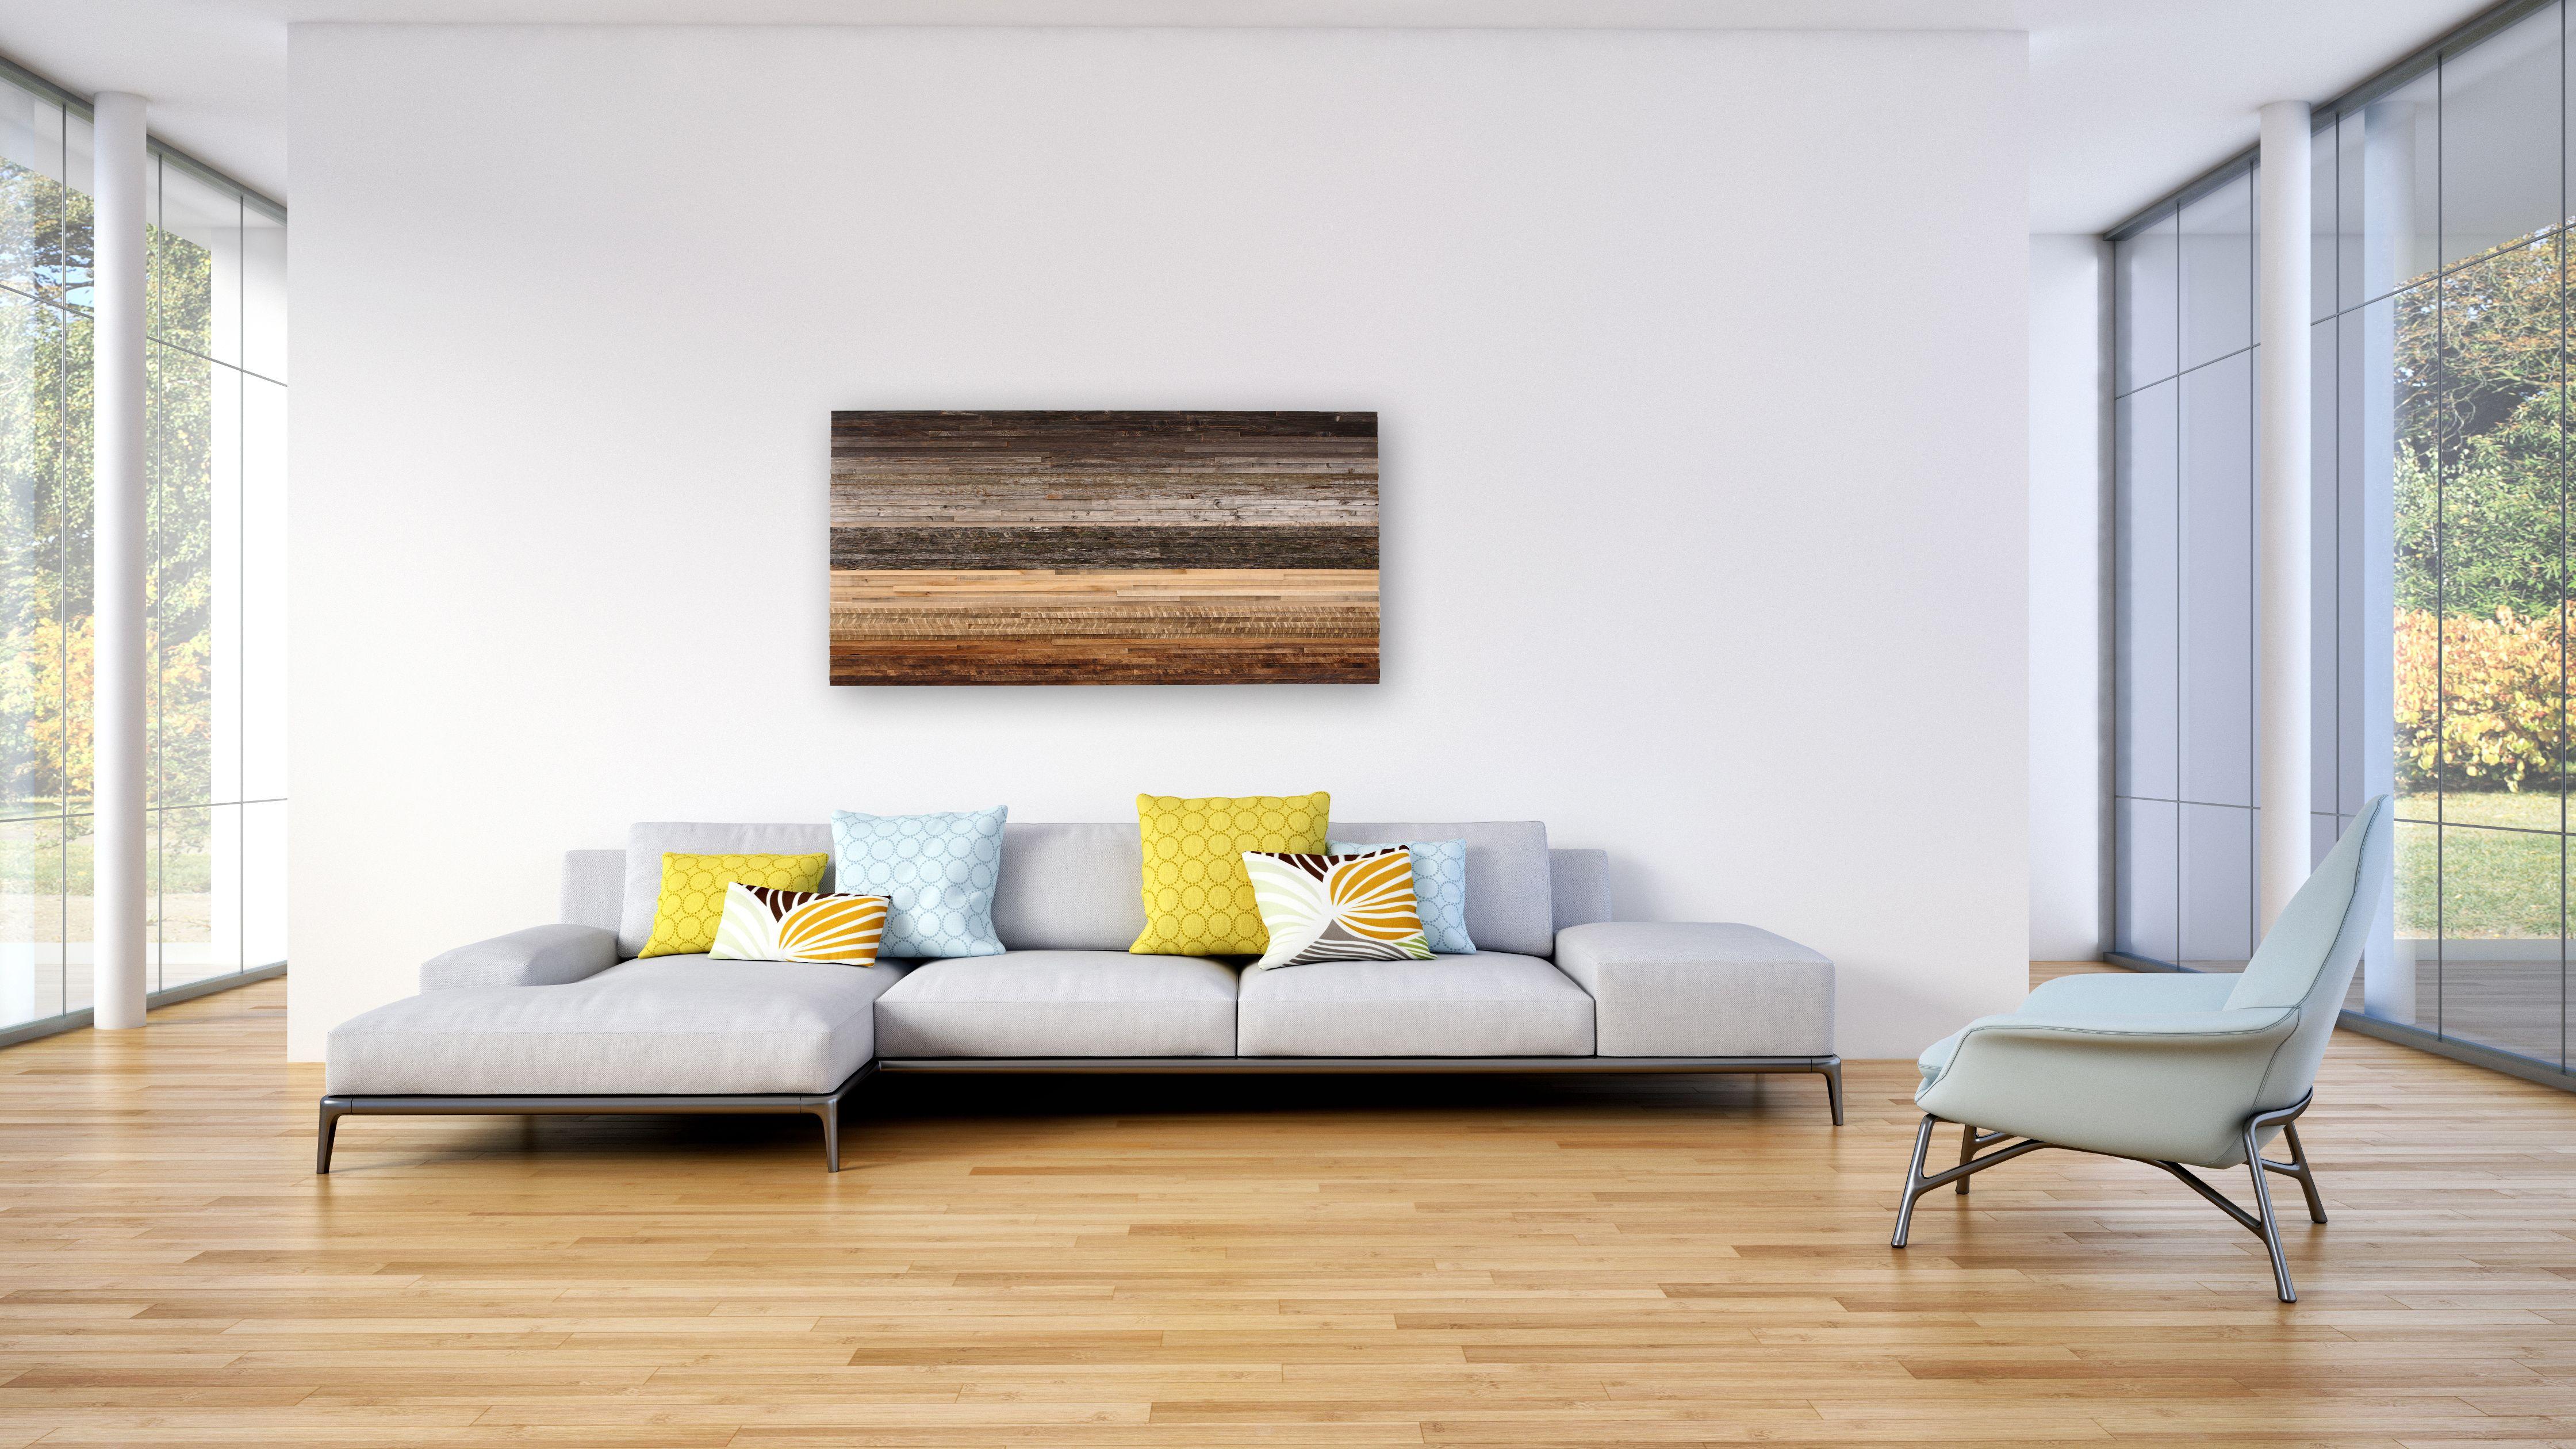 Custom Made Reclaimed Wood Wall Art, Gradient Artwork, Large Wall